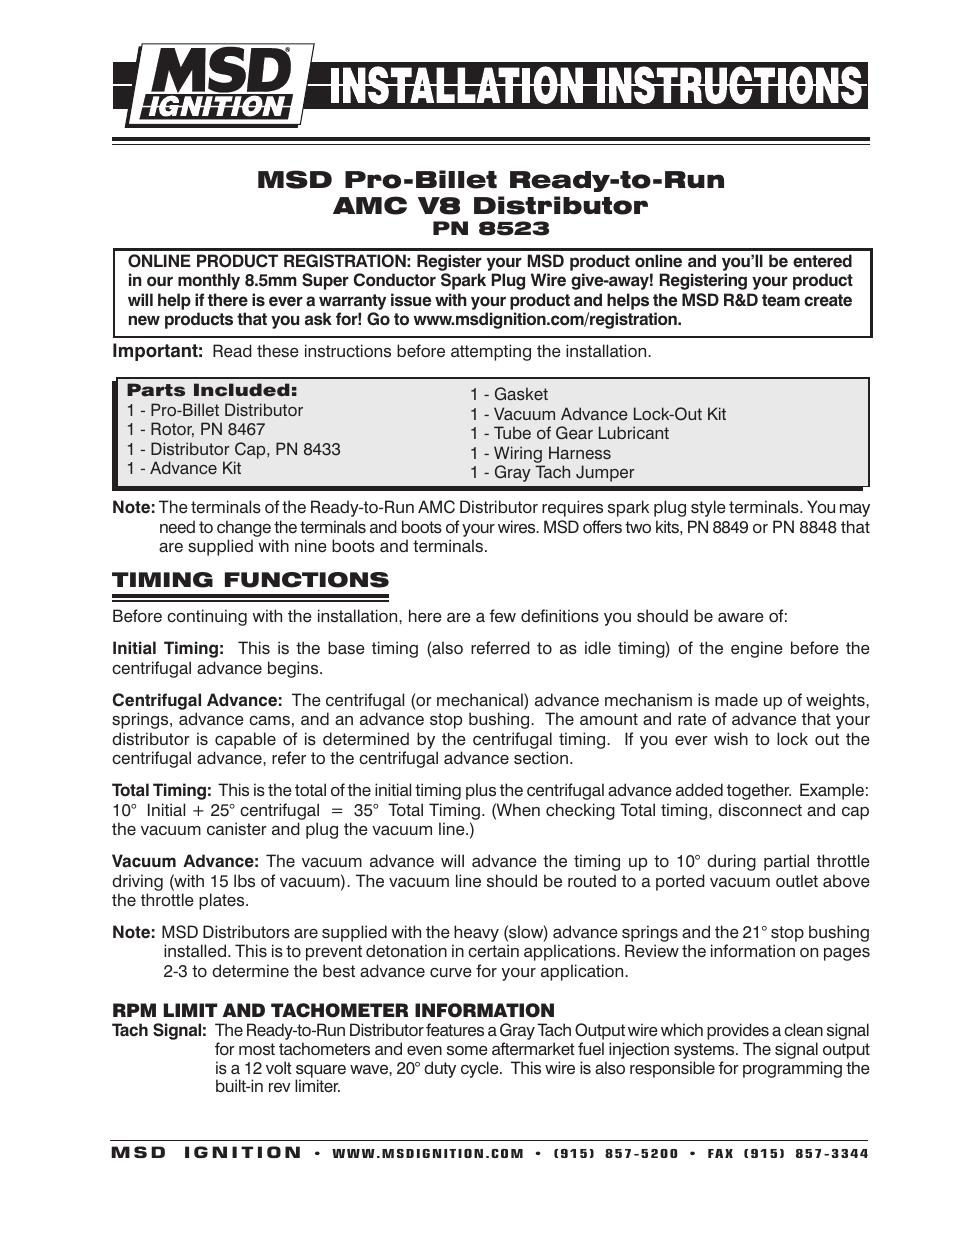 medium resolution of msd 8523 amc v8 ready to run distributor installation user manual 8 pages